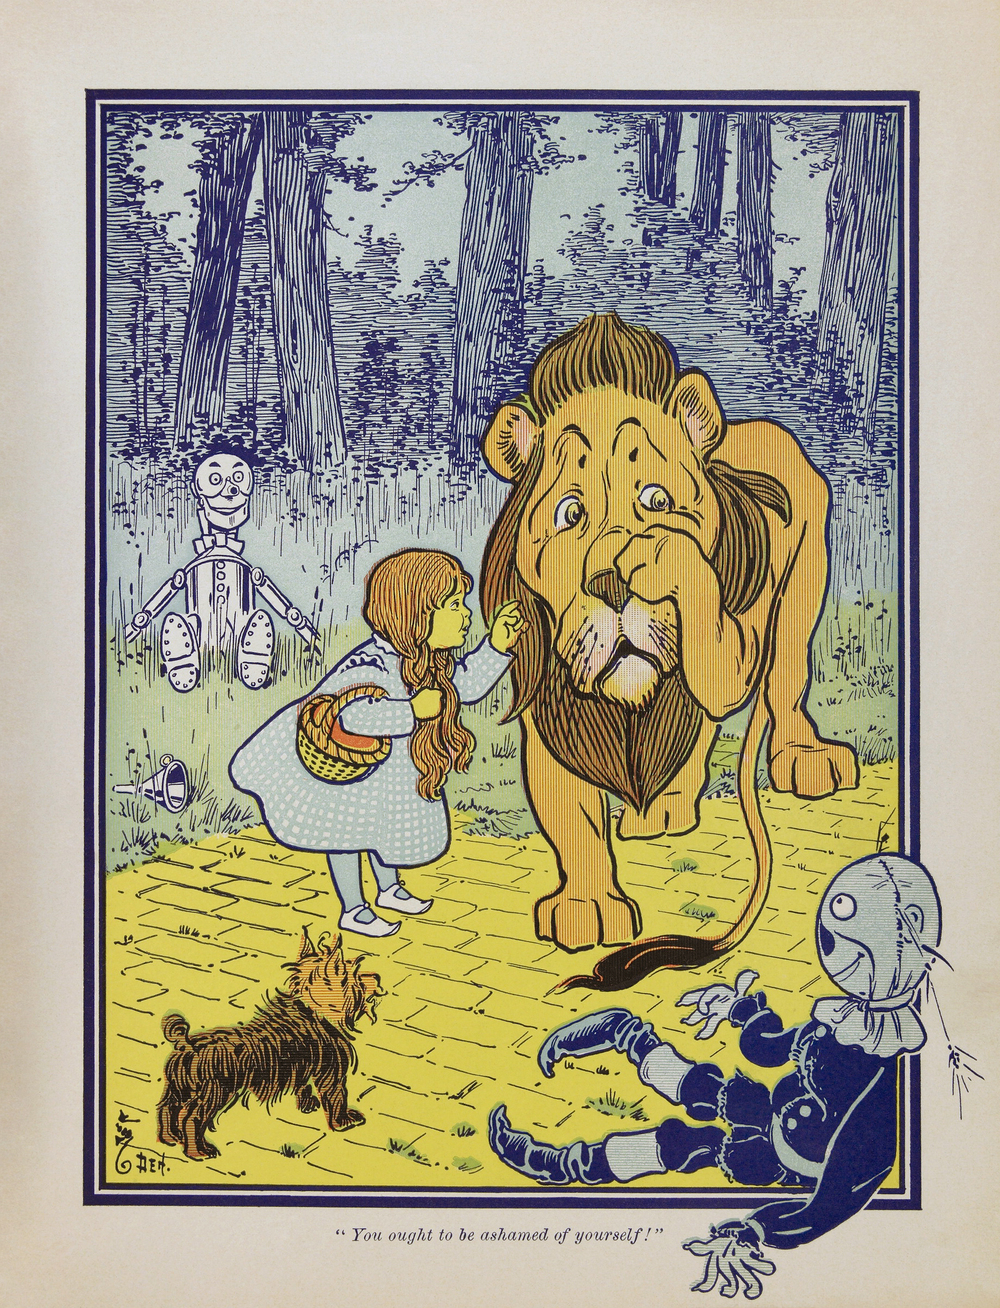 """Cowardly lion2"" Illustration by W.W. Denslow (d. 1915)"